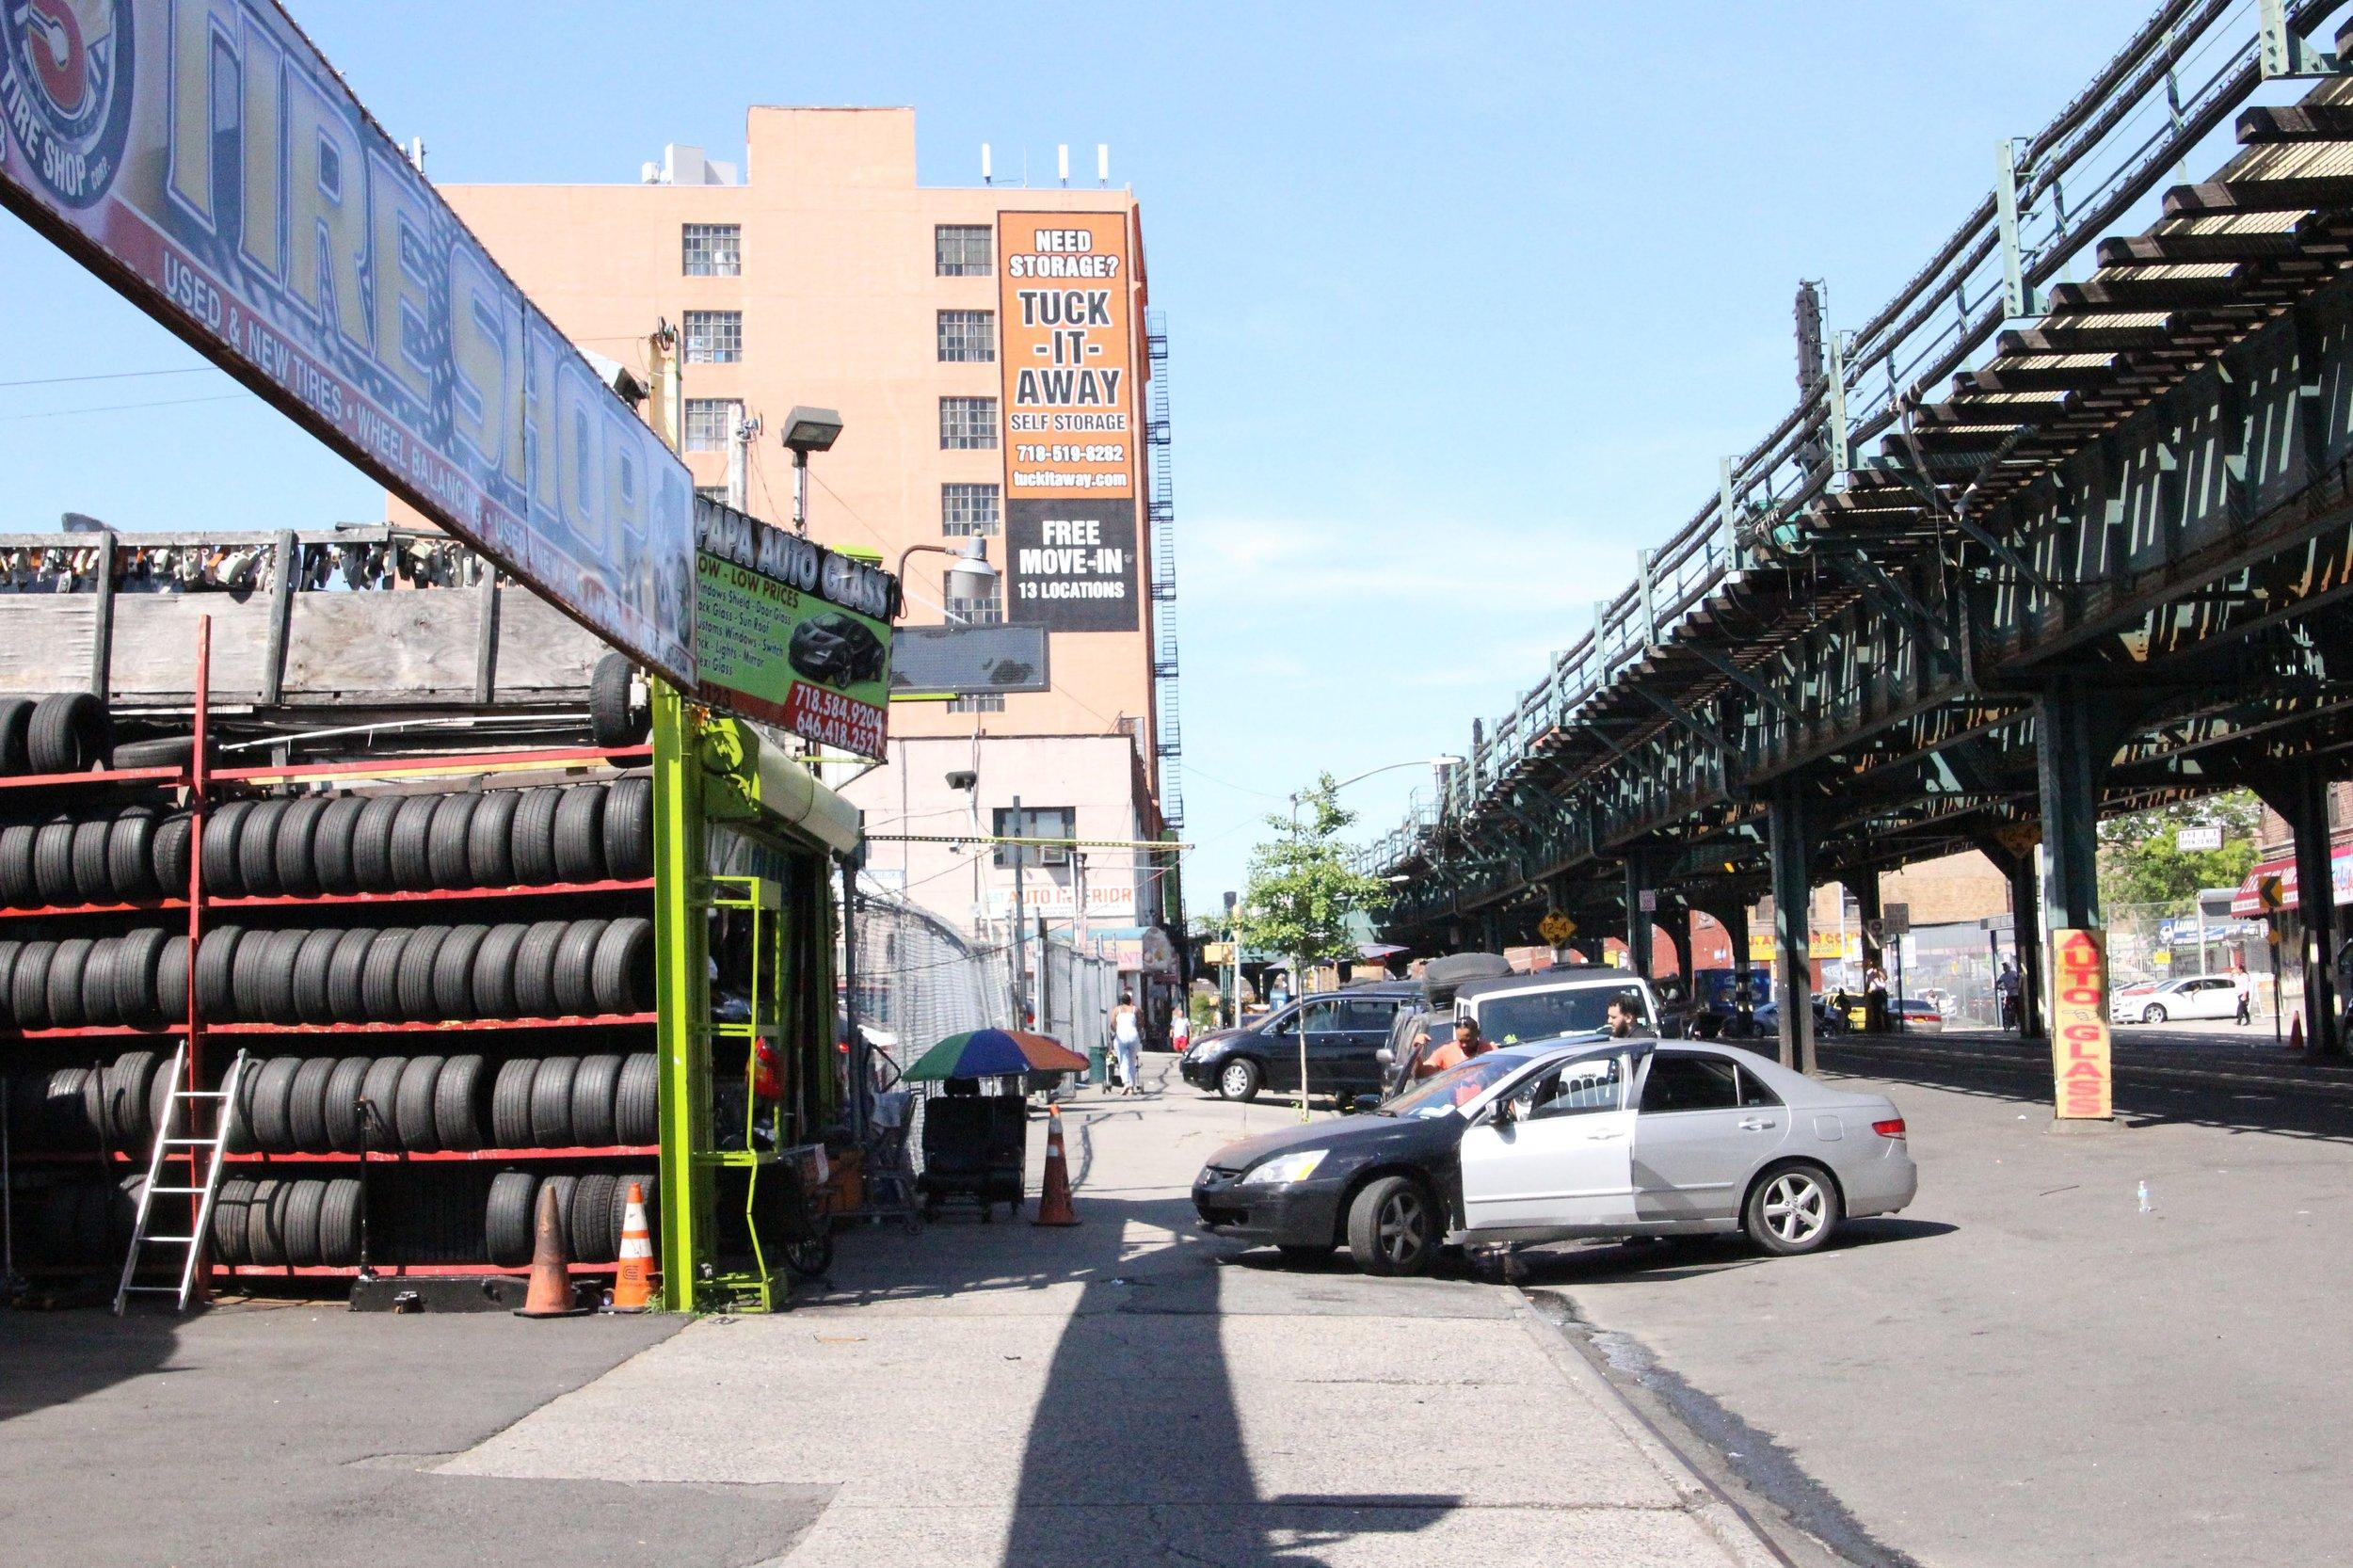 Auto_street.JPG